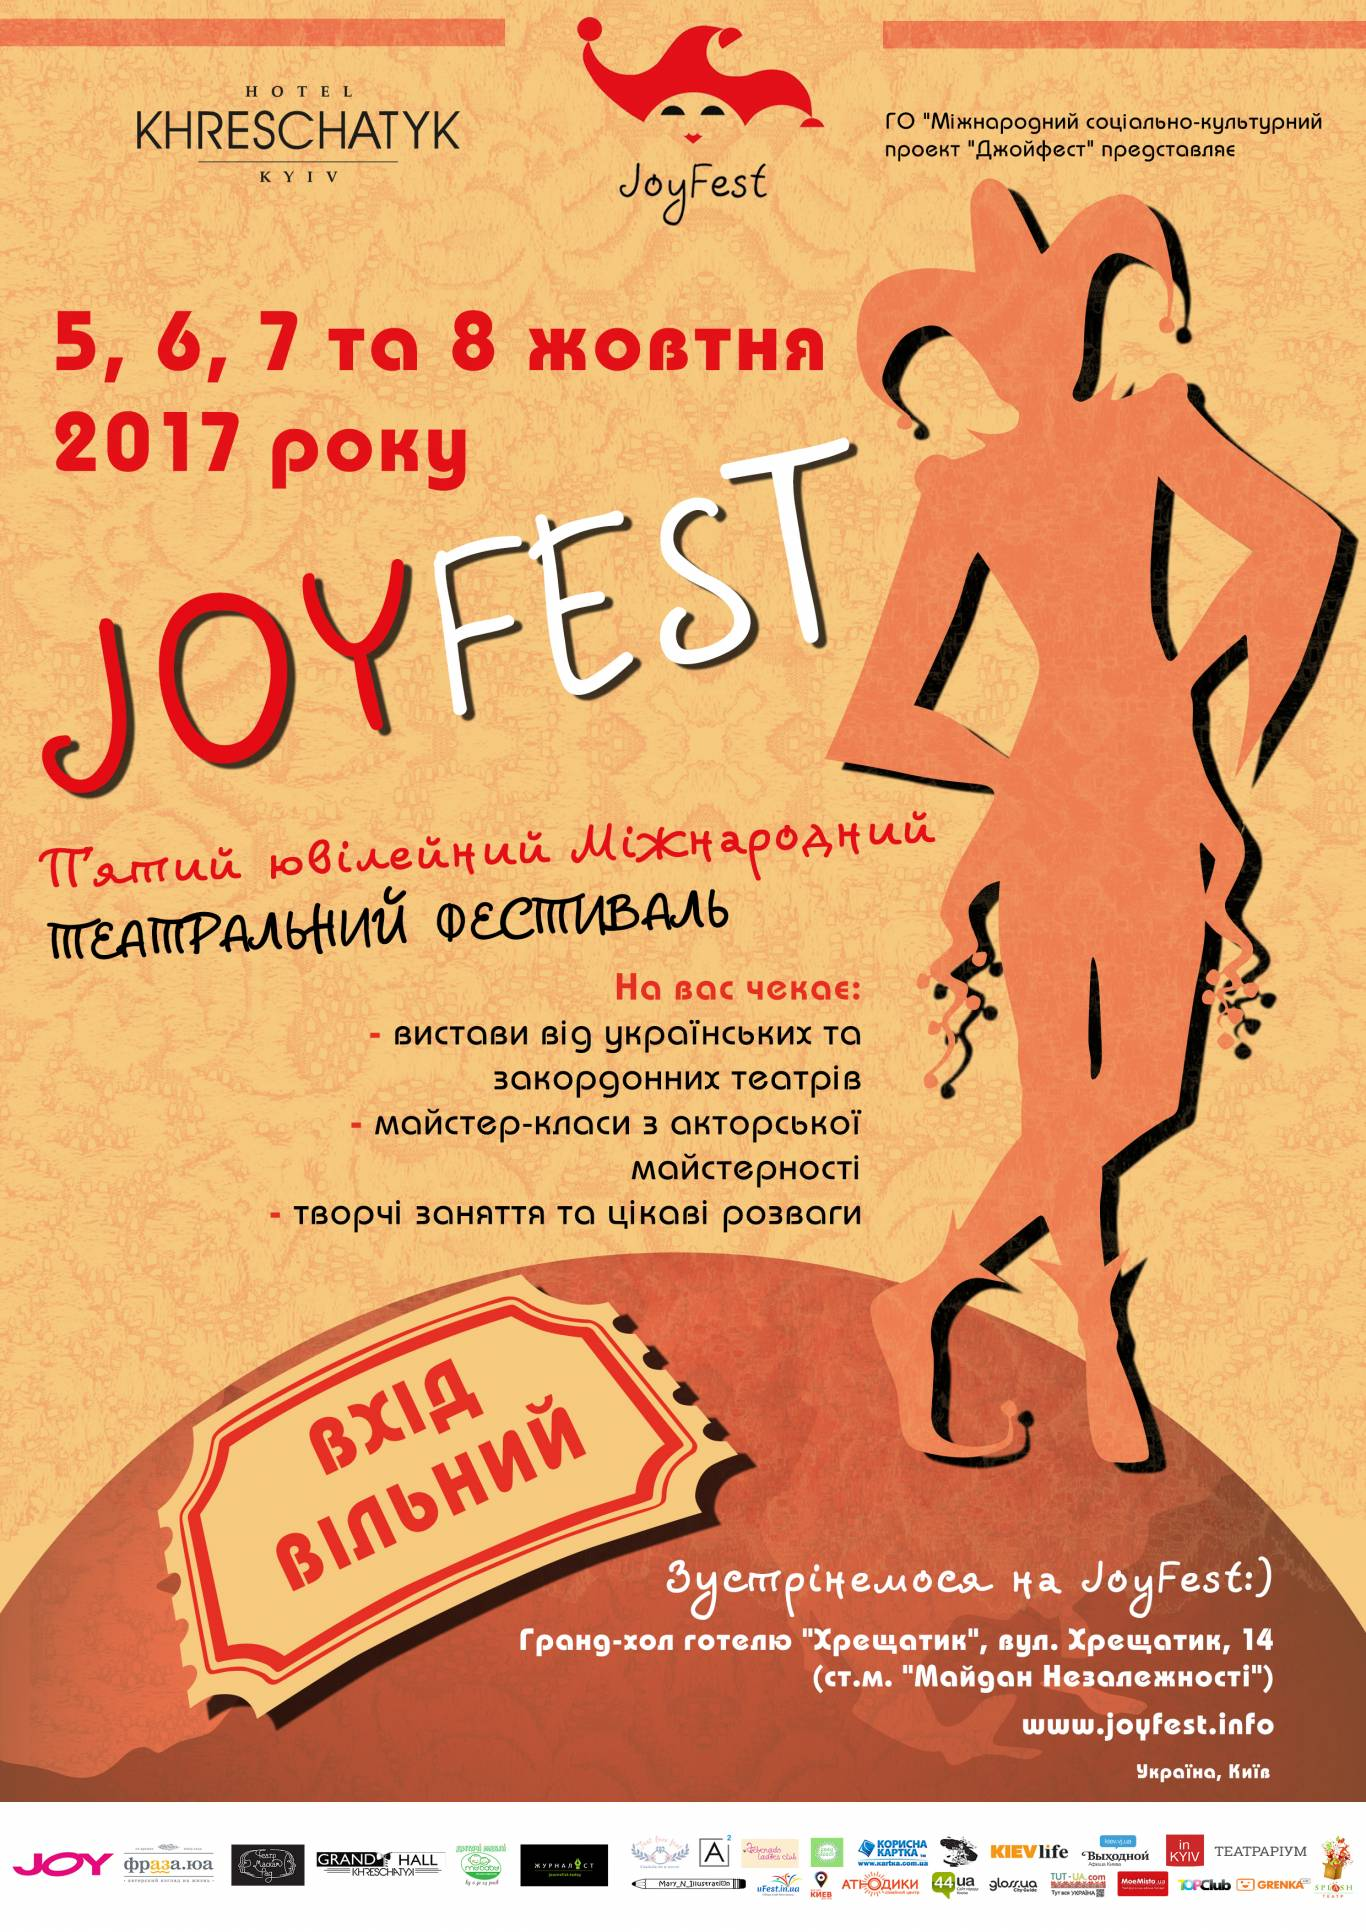 JoyFest-2017